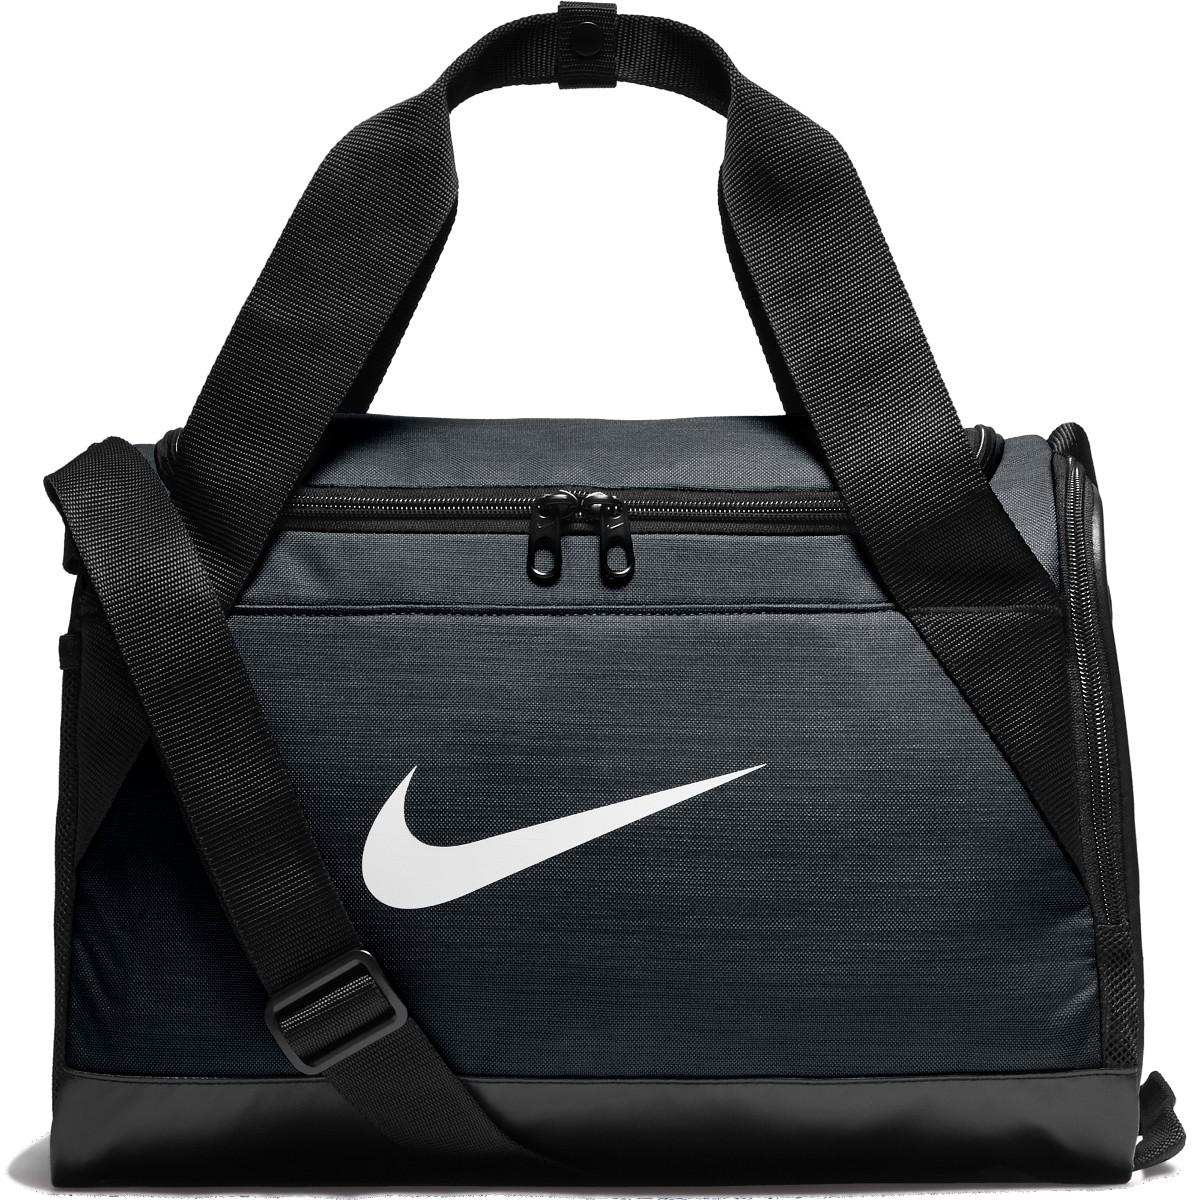 Chica Brasilia Tennispro Extra Bolsa Nike Duffel faI47